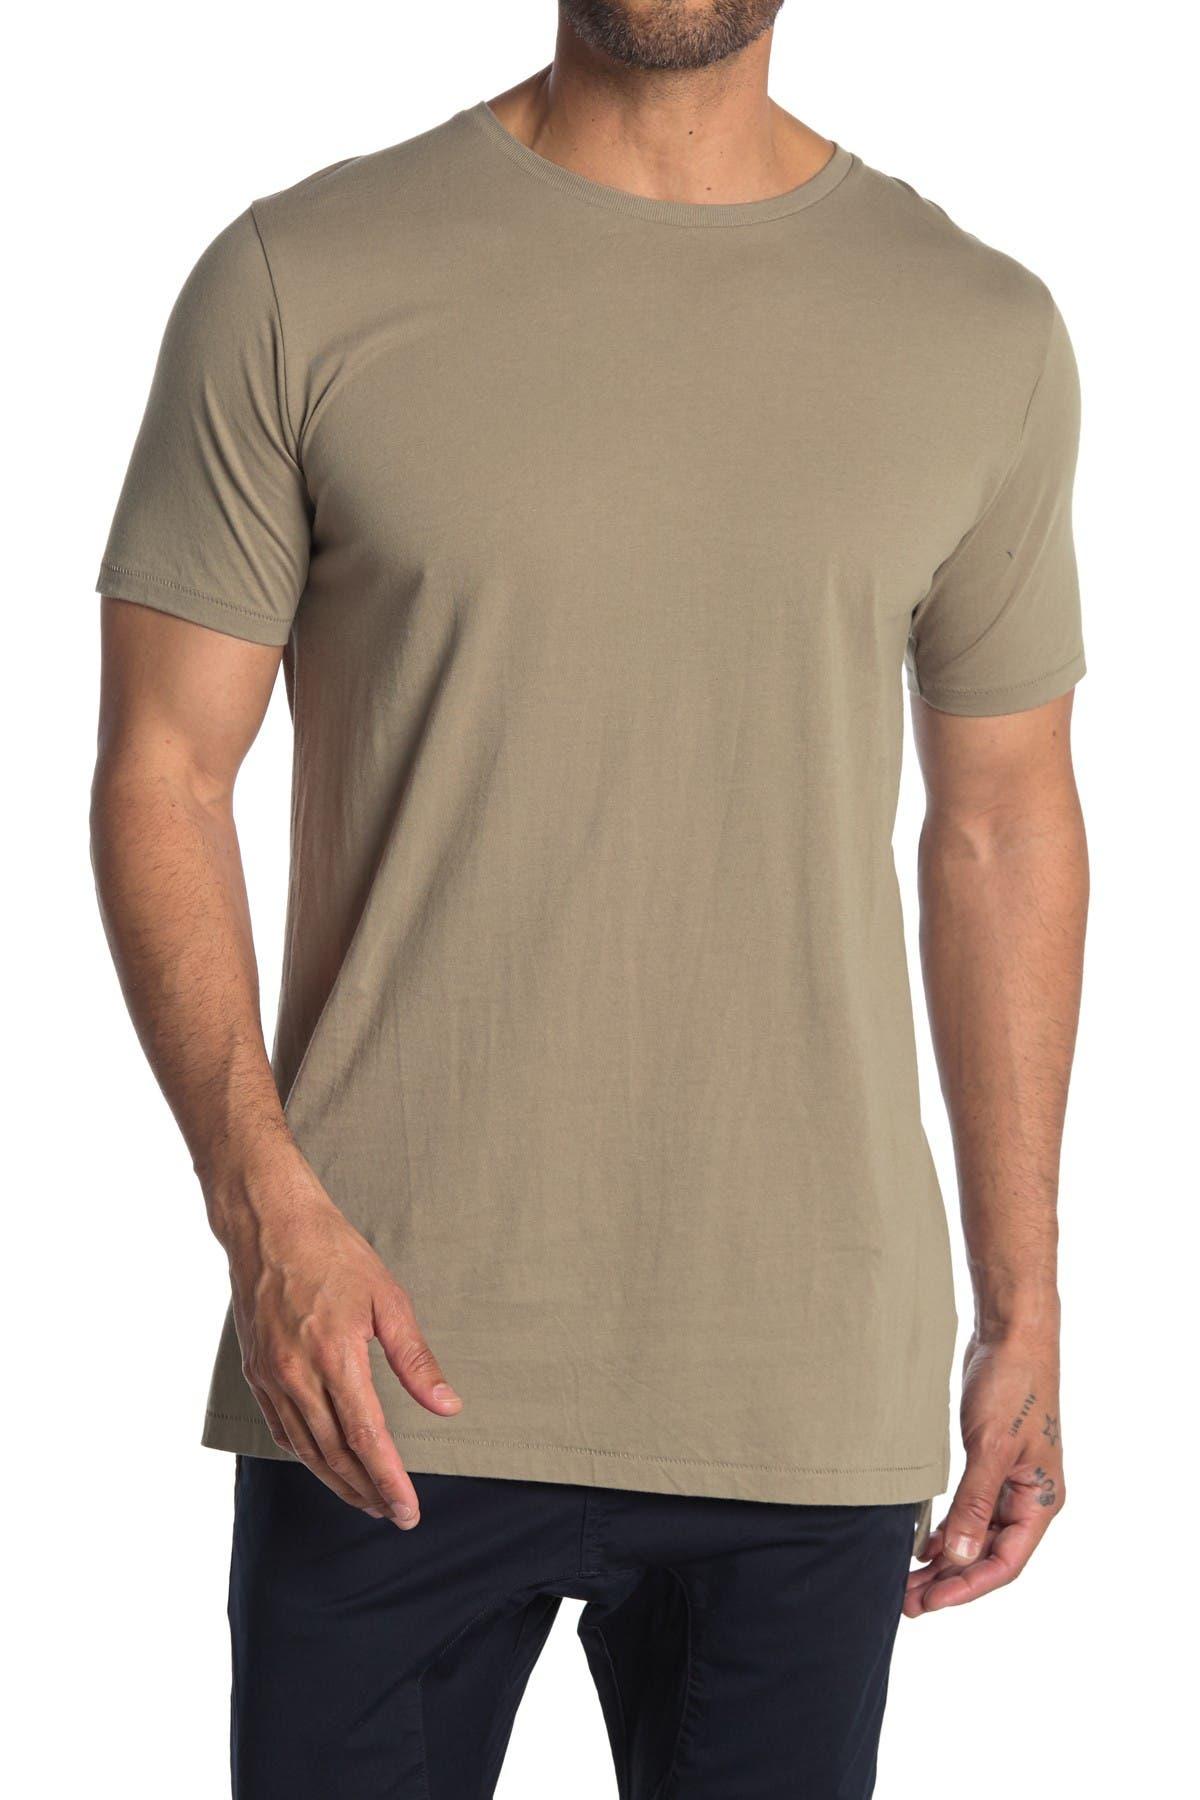 Image of Zanerobe Flintlock T-Shirt